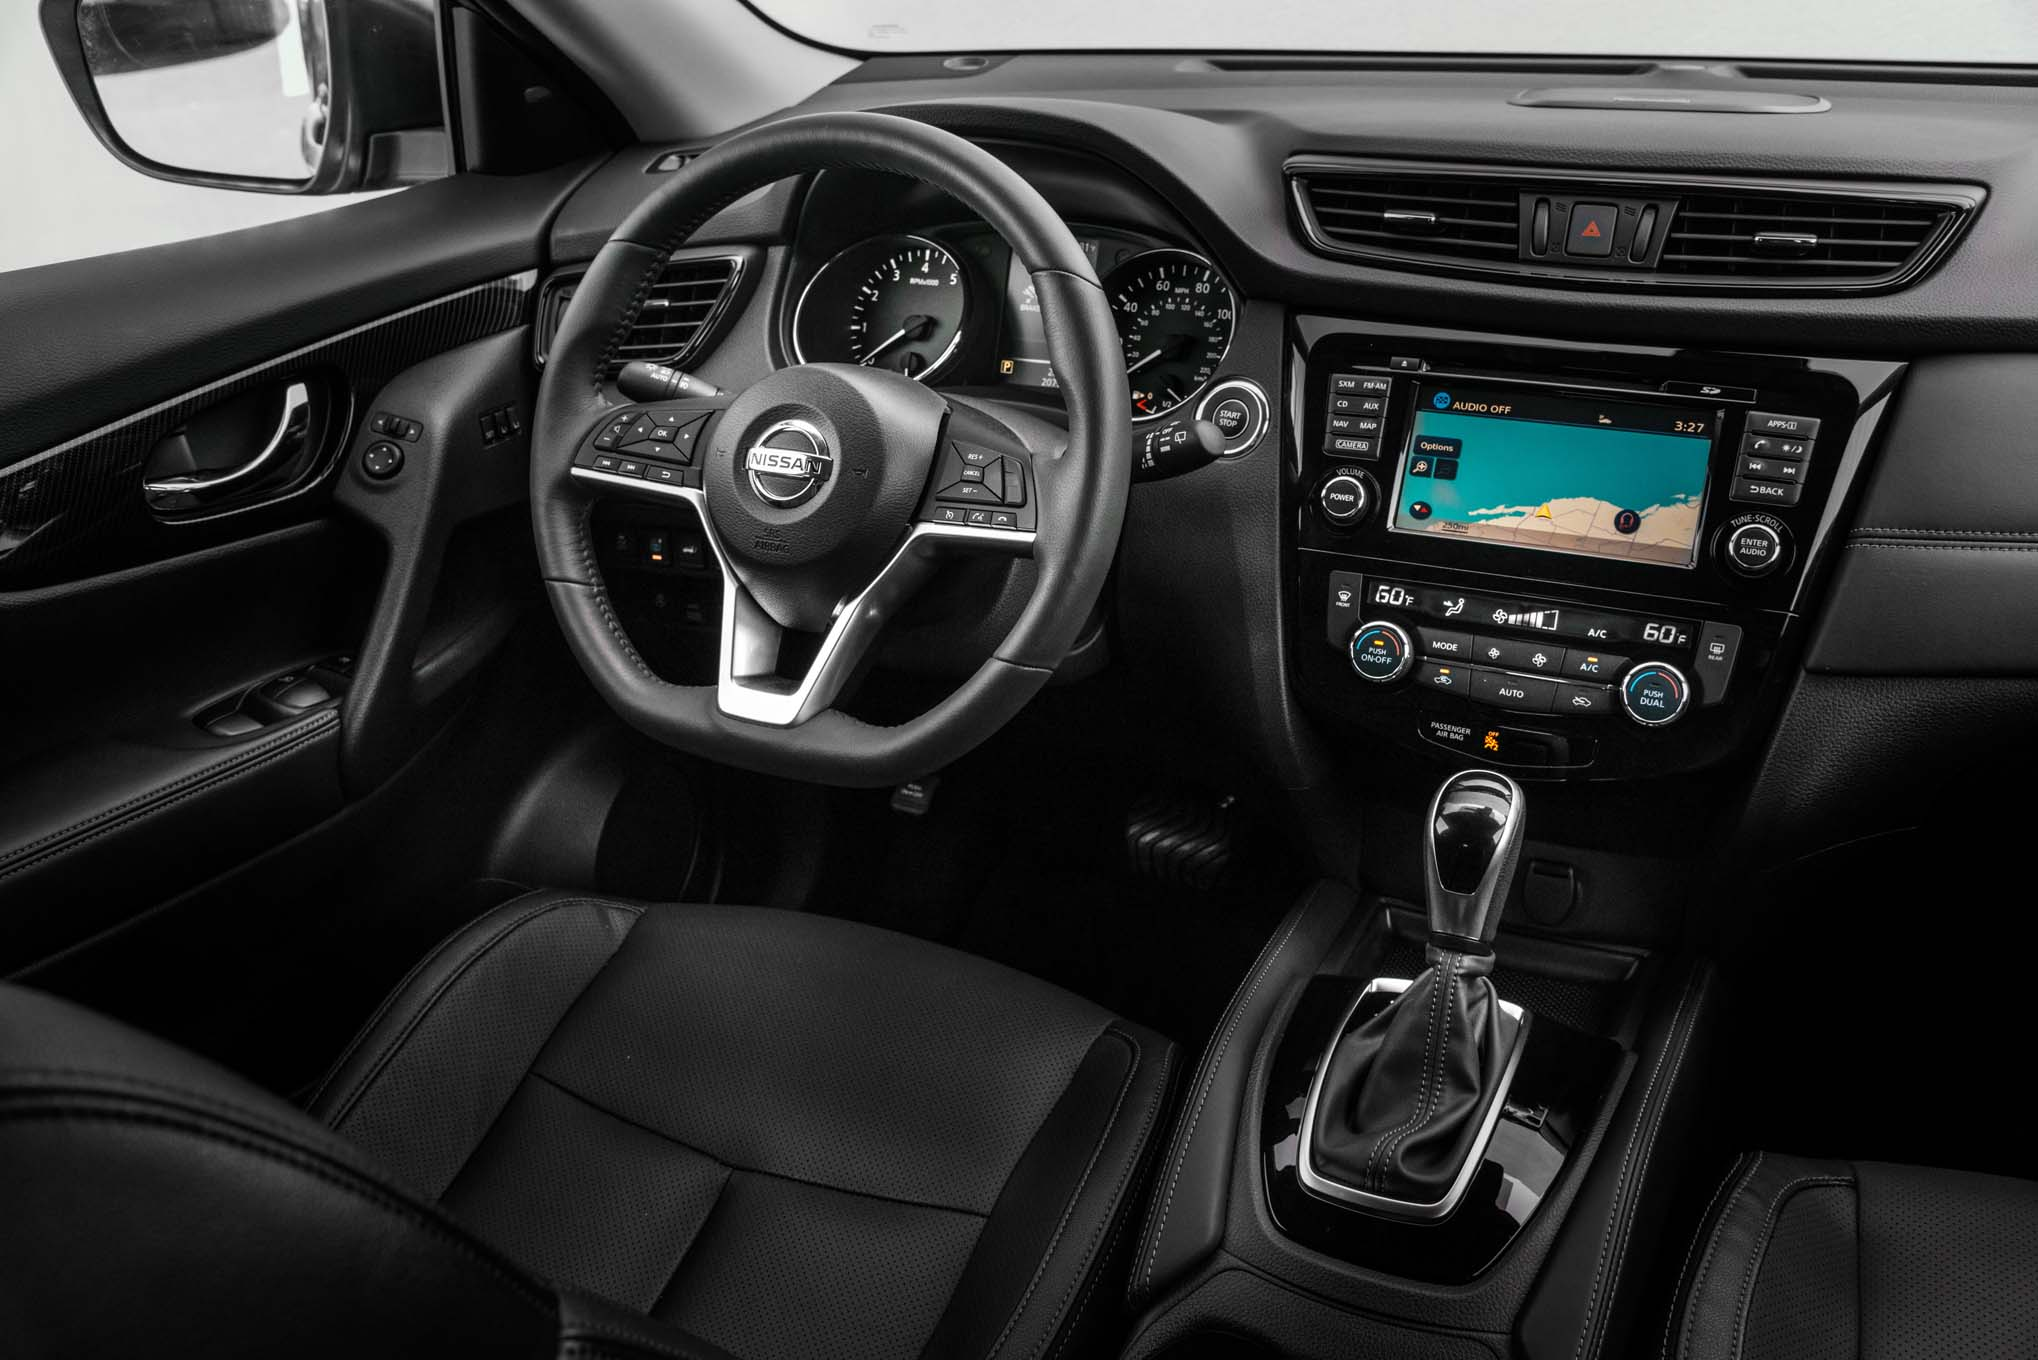 2017 Nissan Rogue Hybrid Interior Motor Trend En Espa Ol